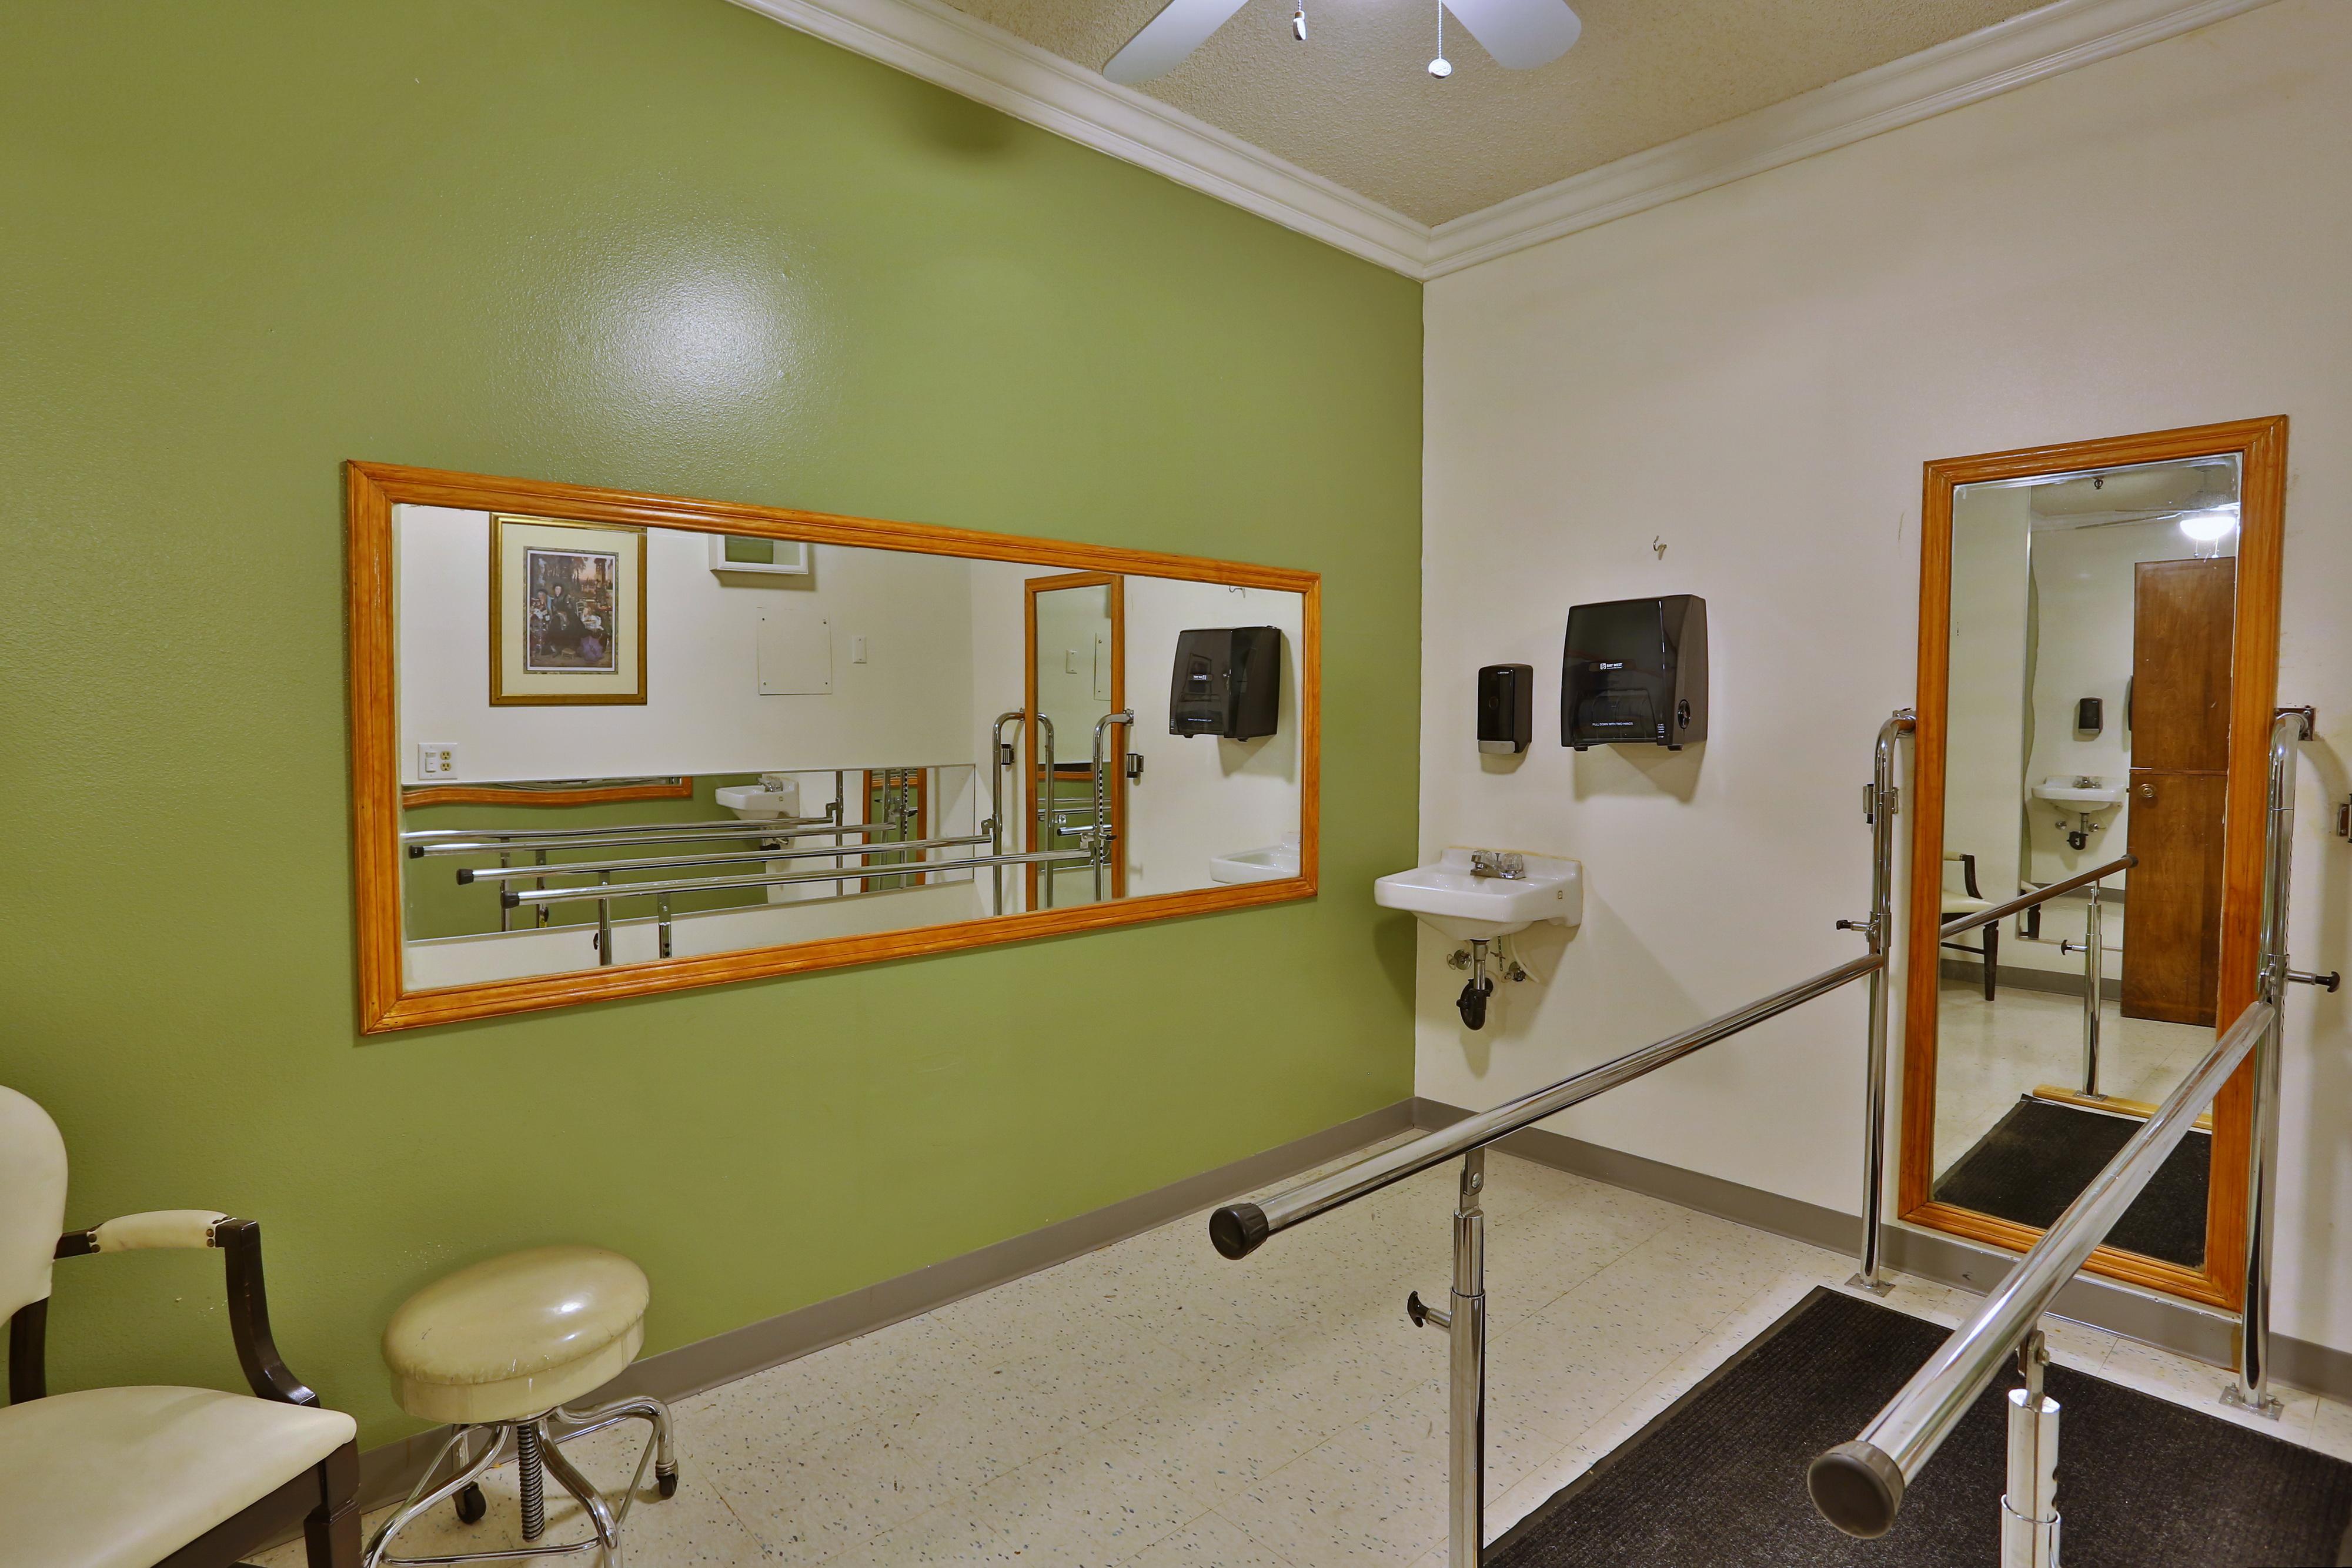 Villa Redondo Physical Therapy Room